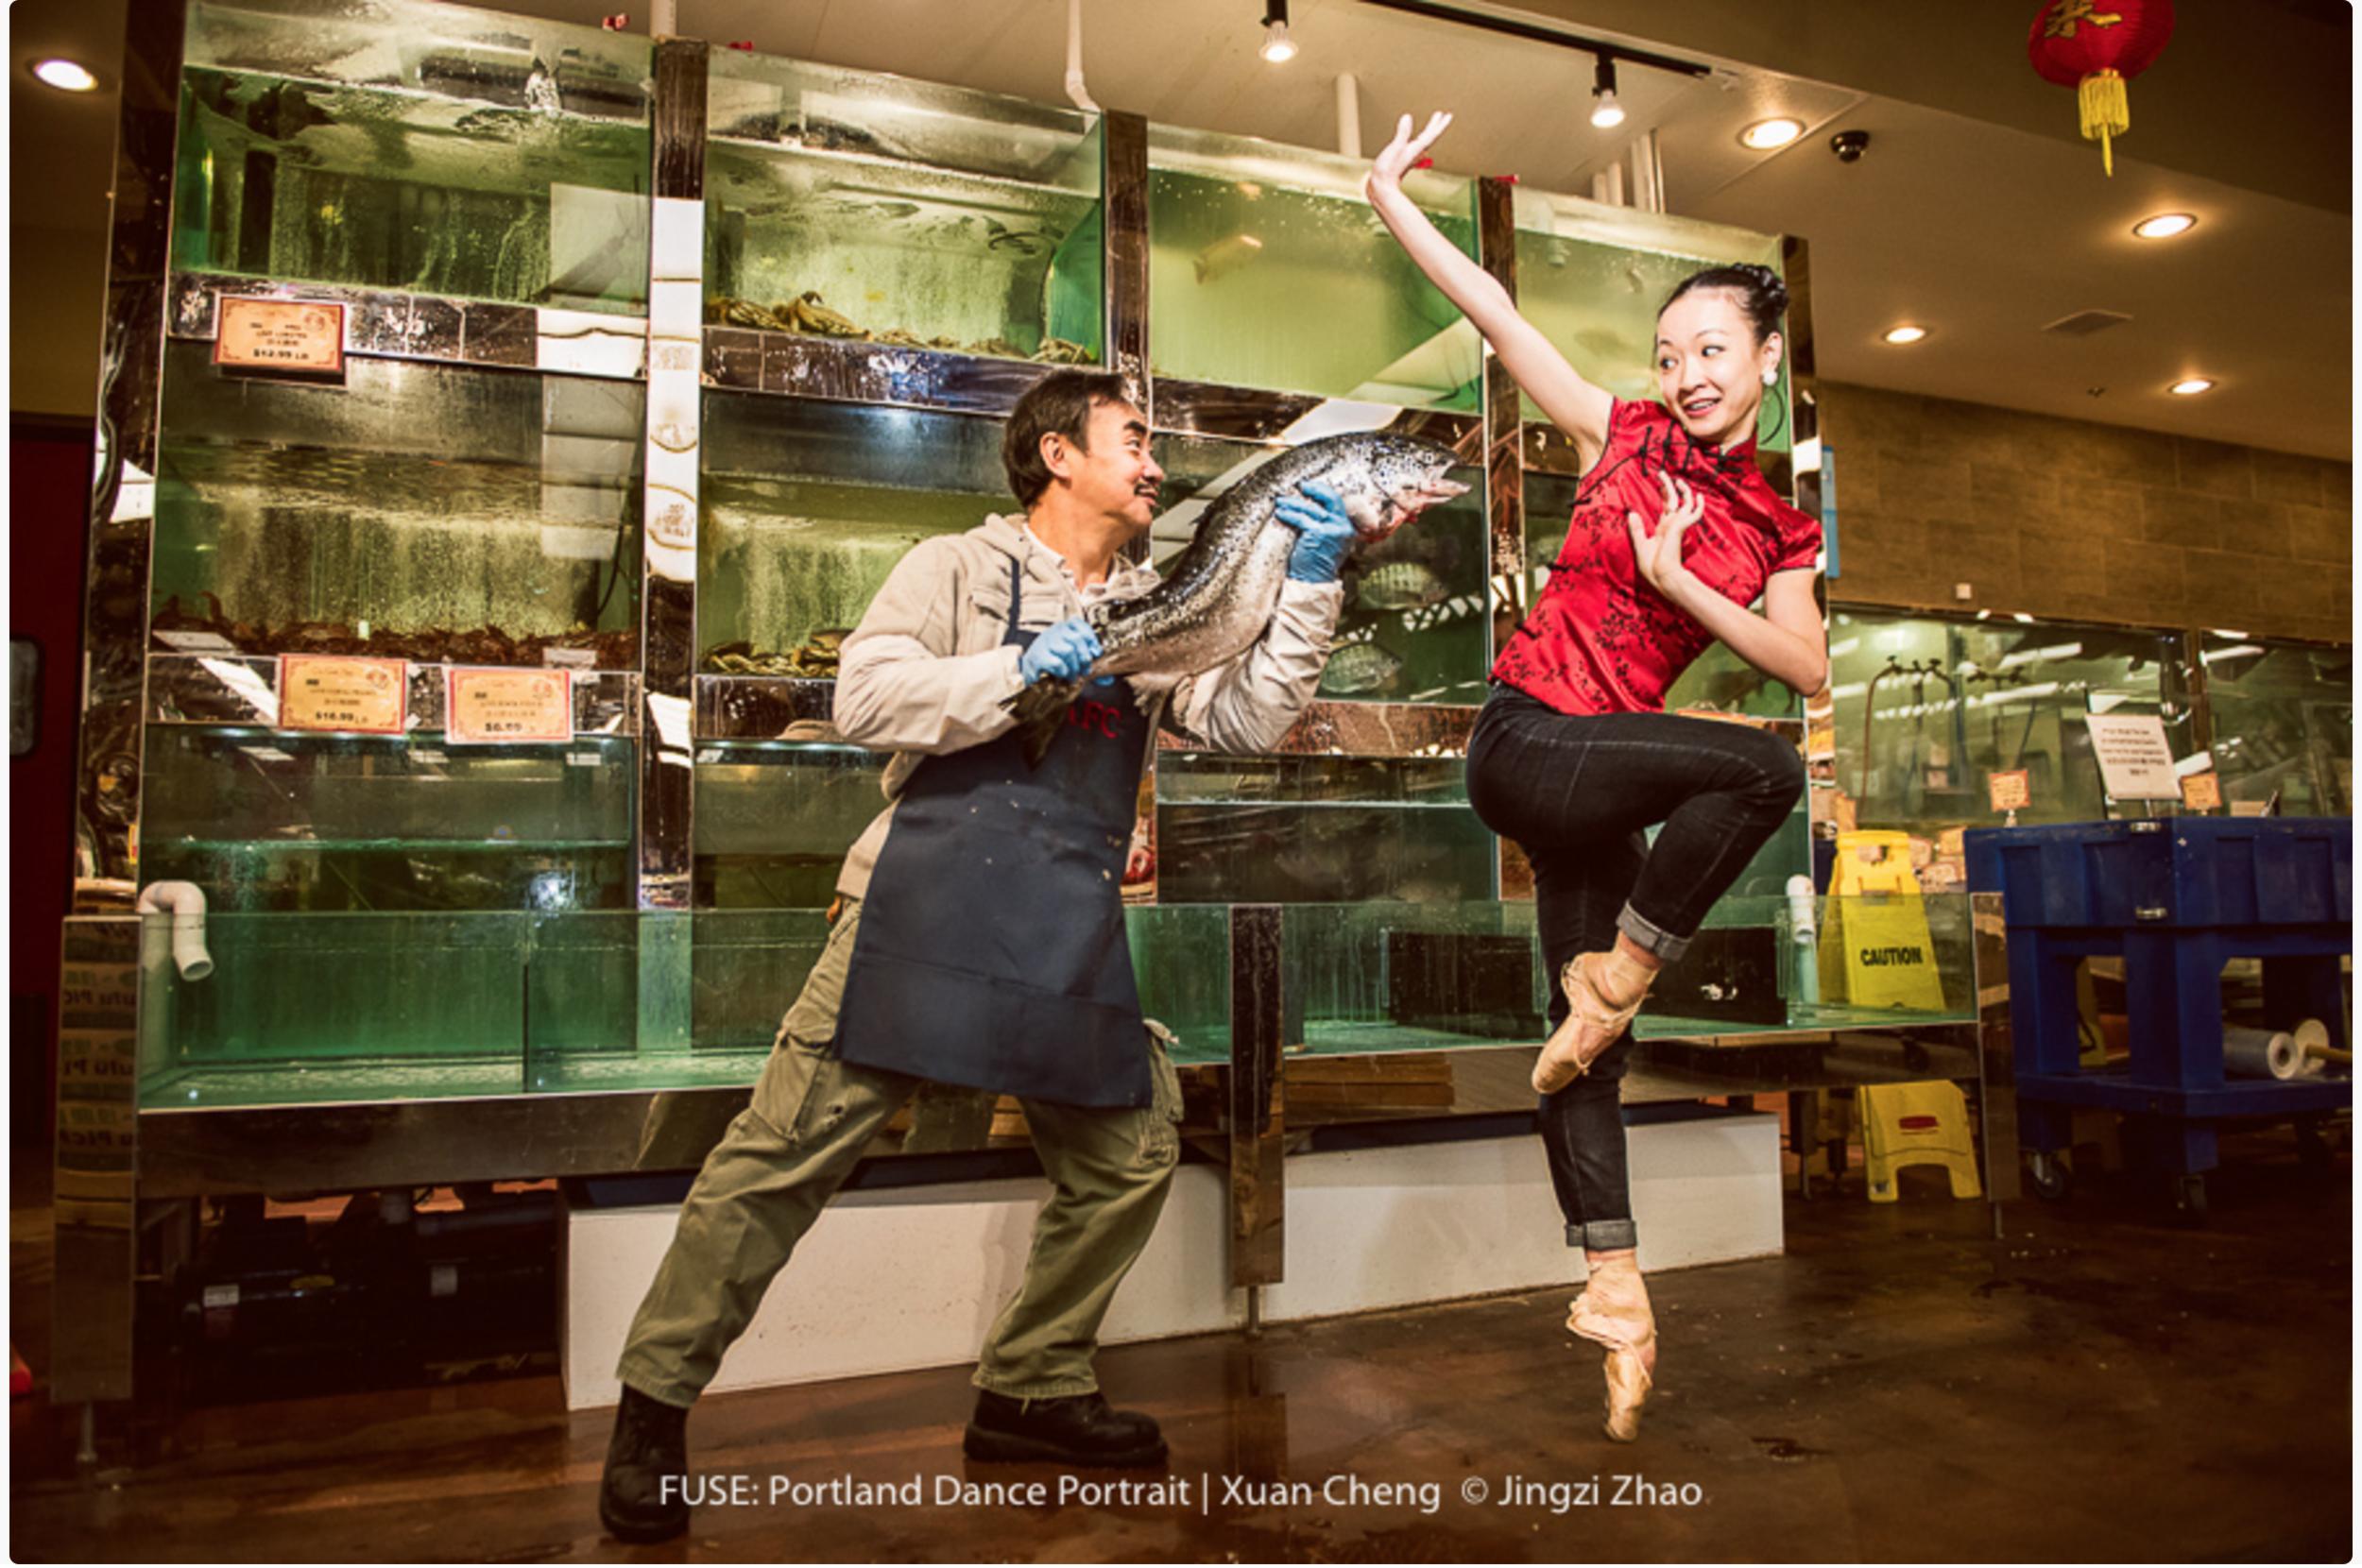 Xuan Cheng at Oregon Ballet Theater